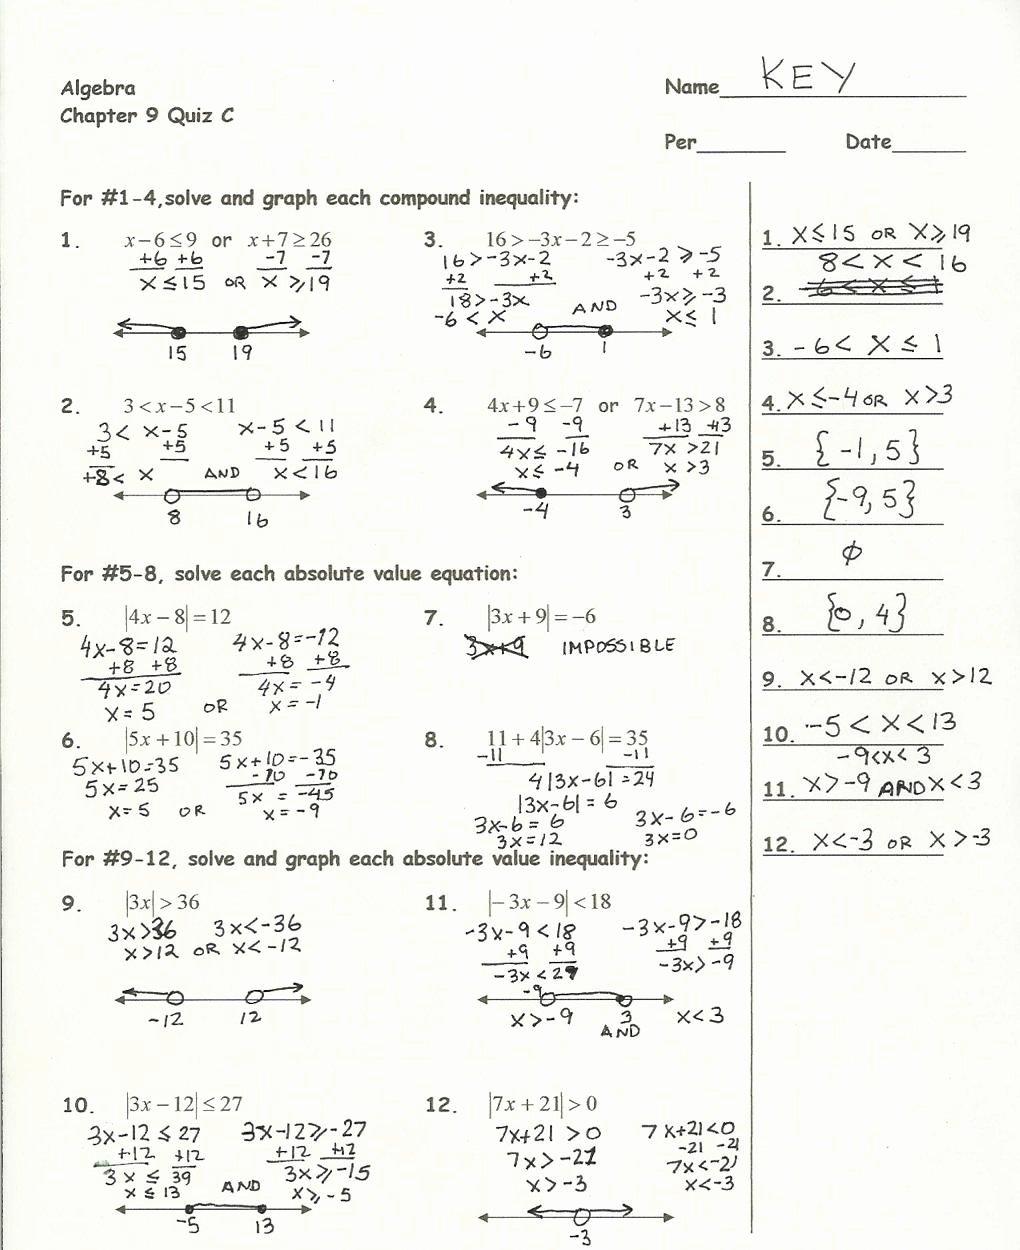 Graphing Quadratics Worksheet Answers Inspirational Graphing Parabolas Worksheet Algebra 1